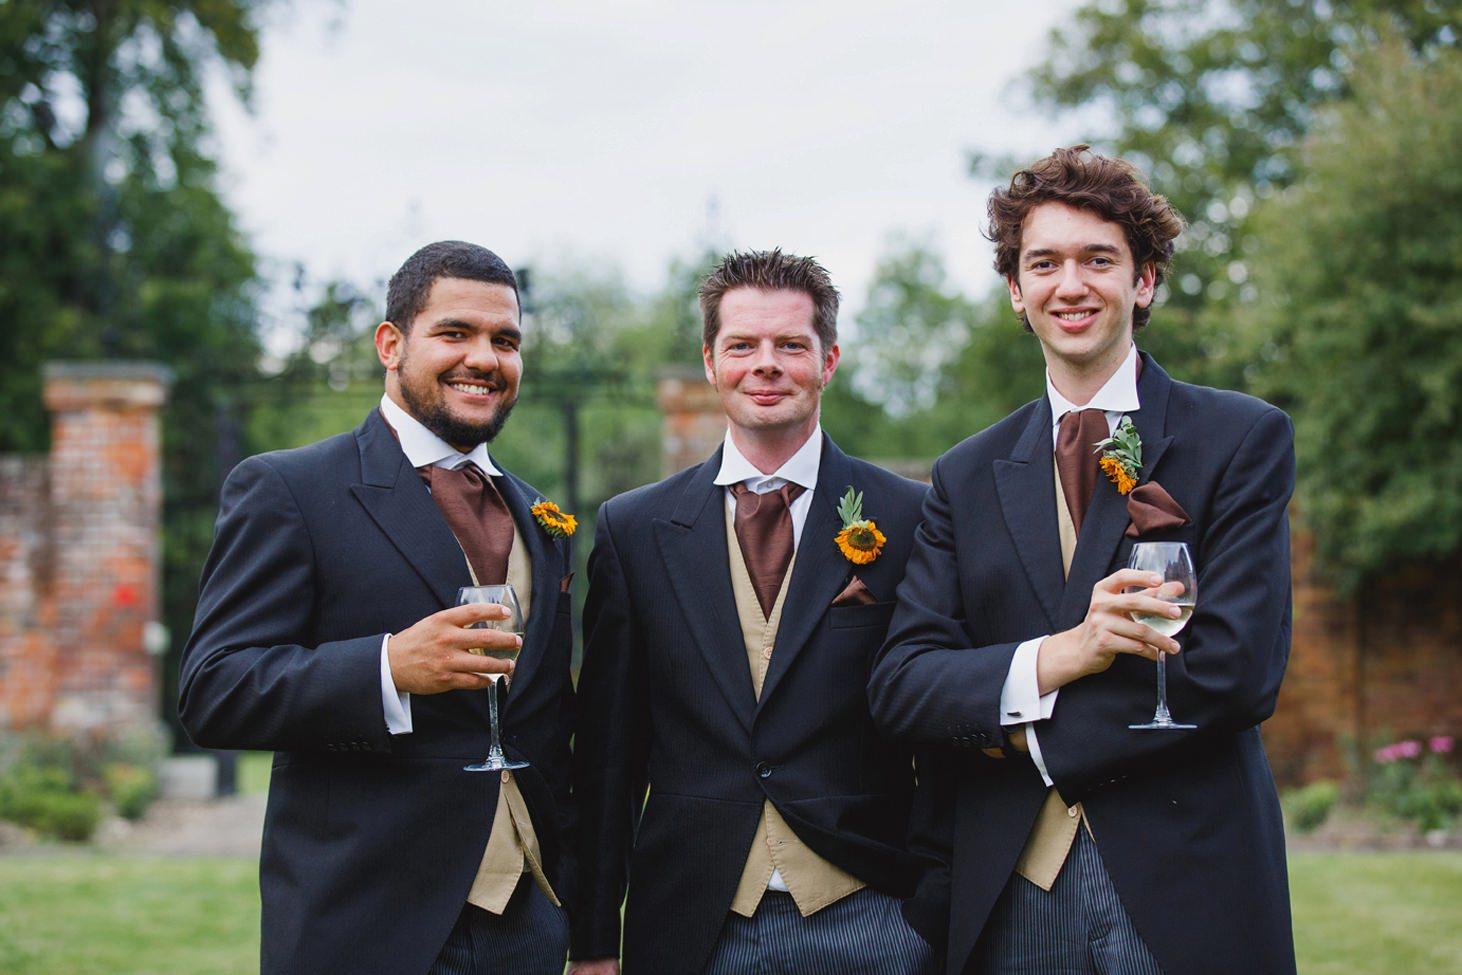 Wycombe Abbey wedding photography groomsmen portrait